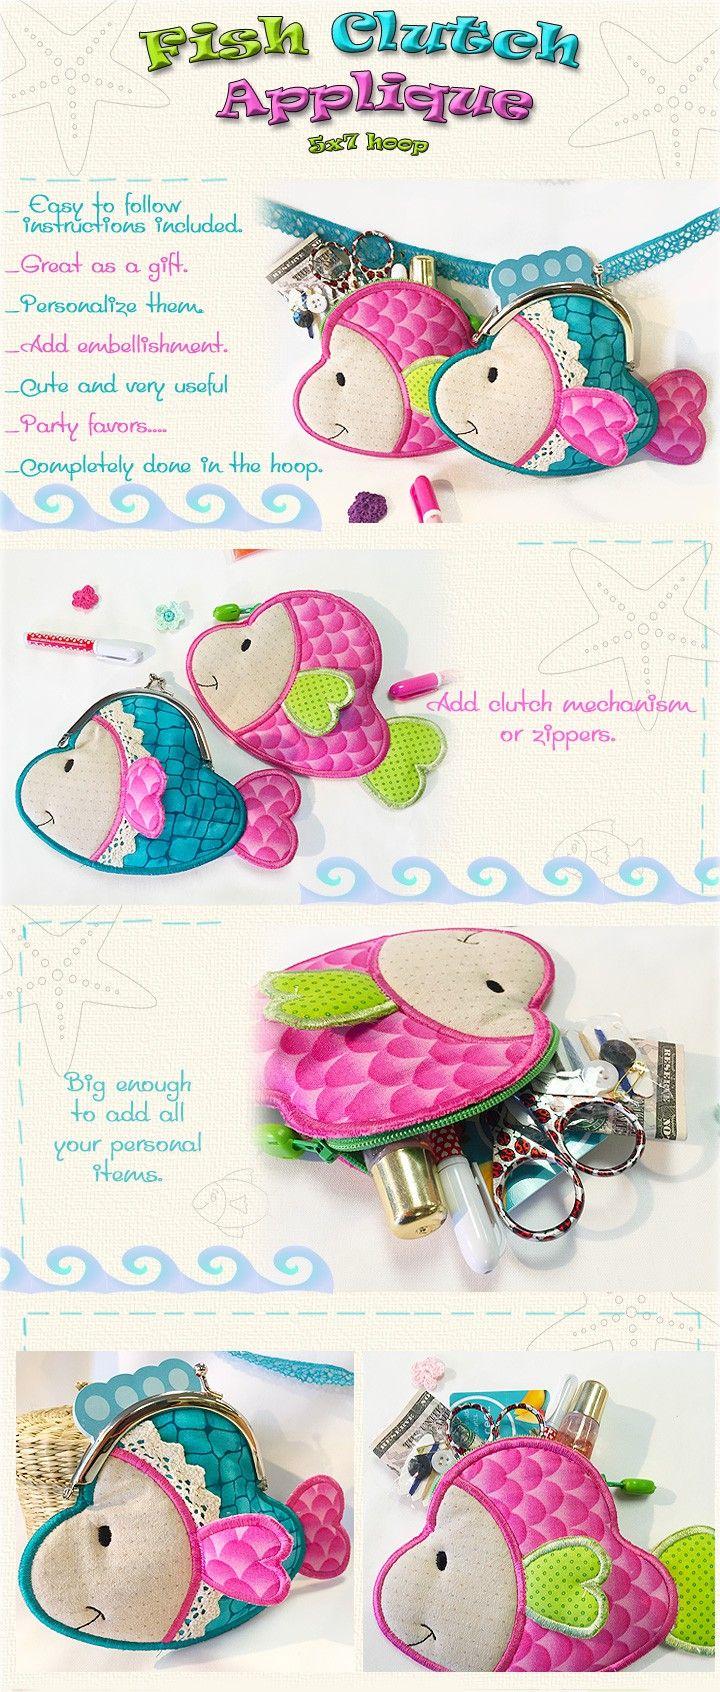 Fishclutch embroidery smart needle pinterest fish fabric